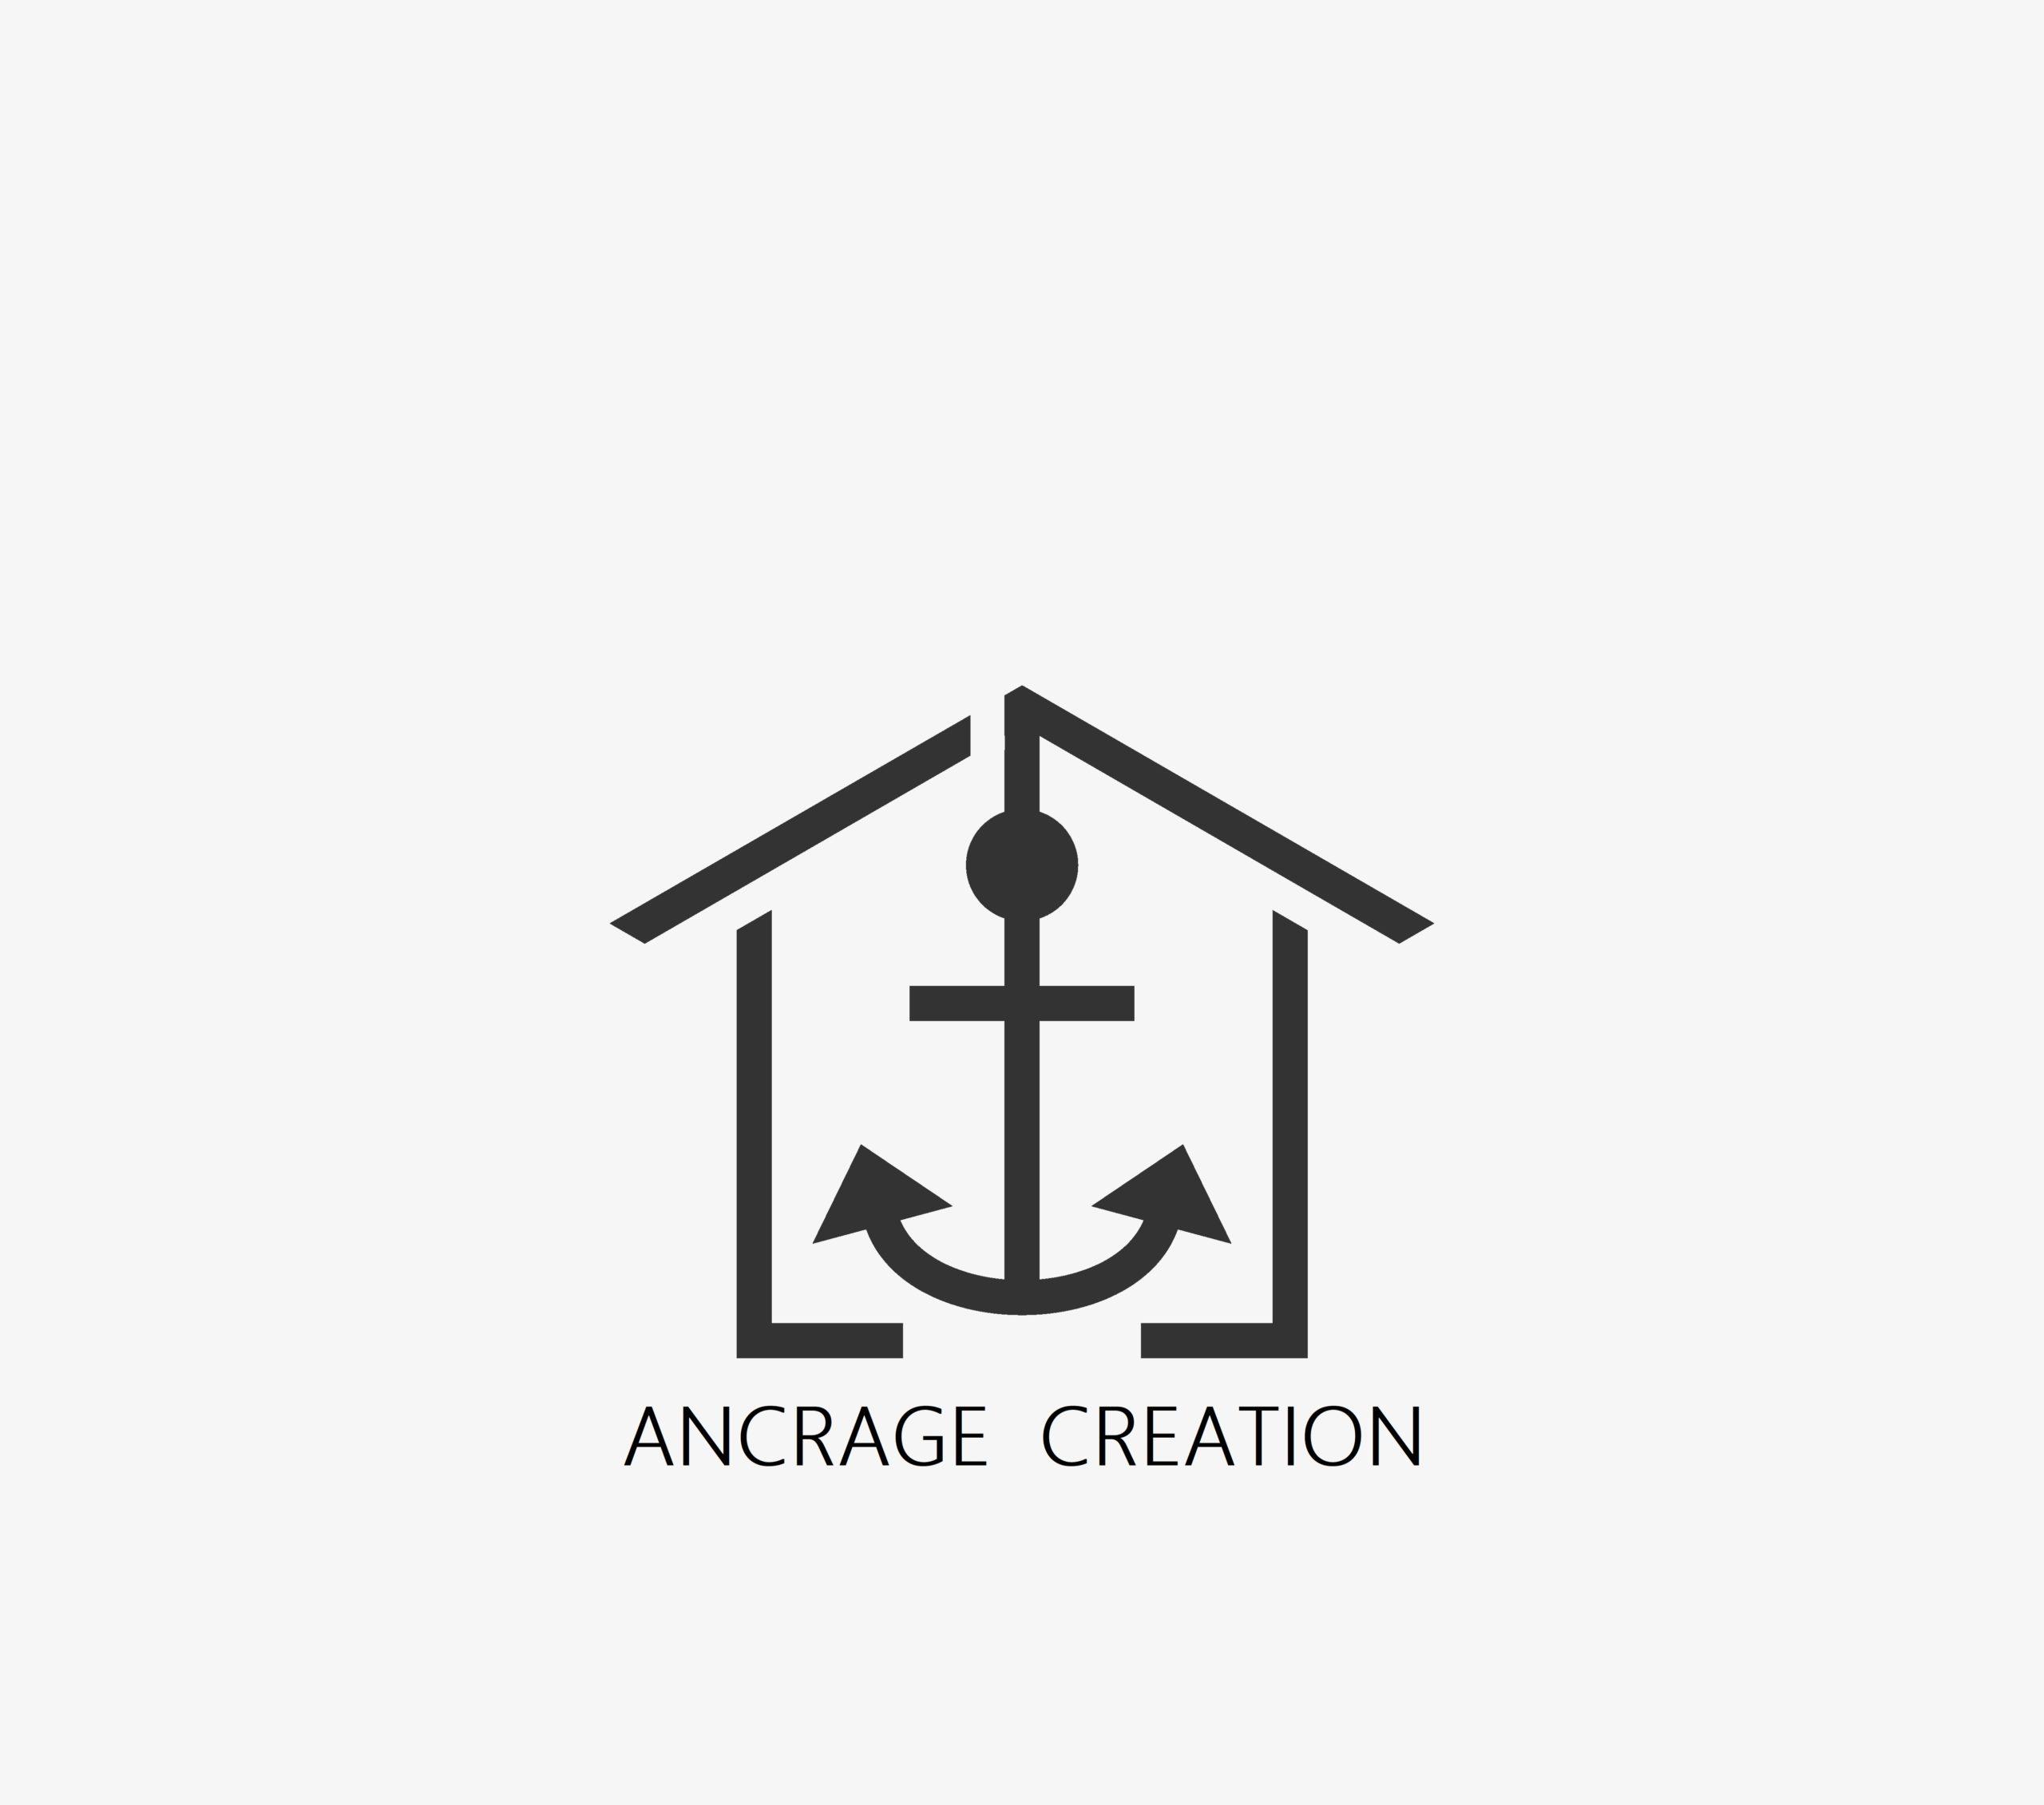 Logo ancrage création